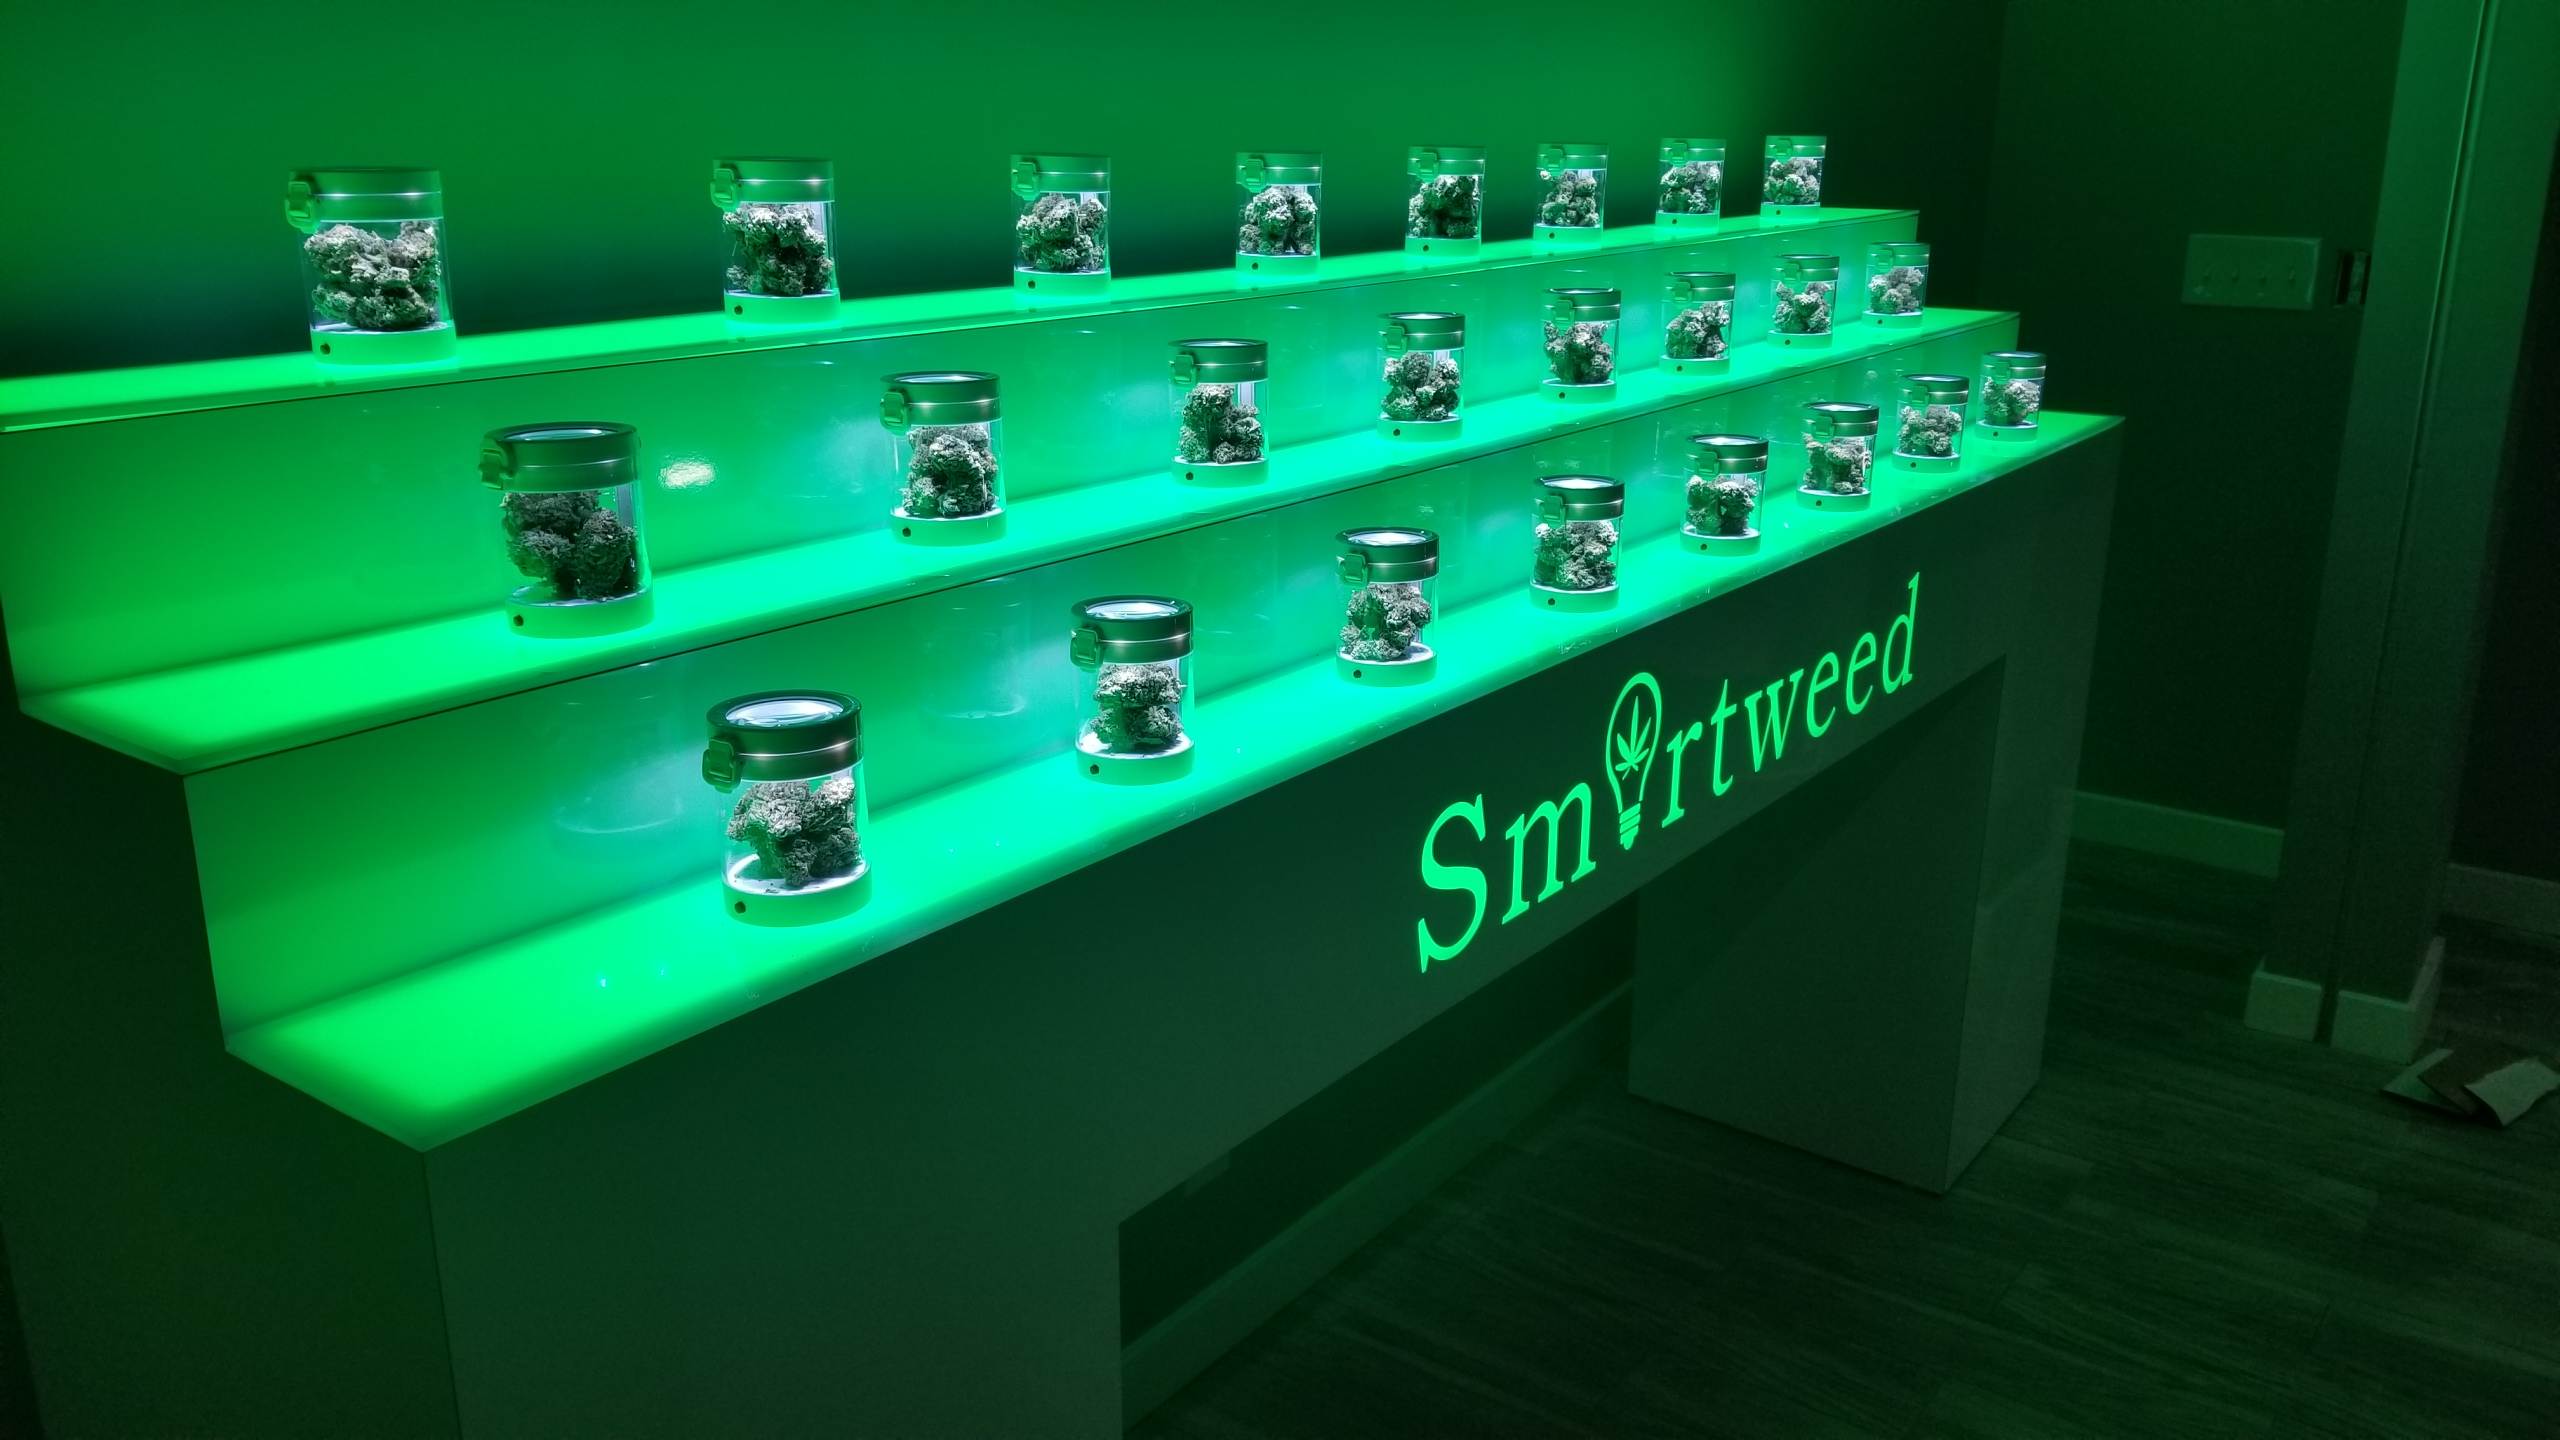 Recreational Cannabis | Los Angeles | Smartweed